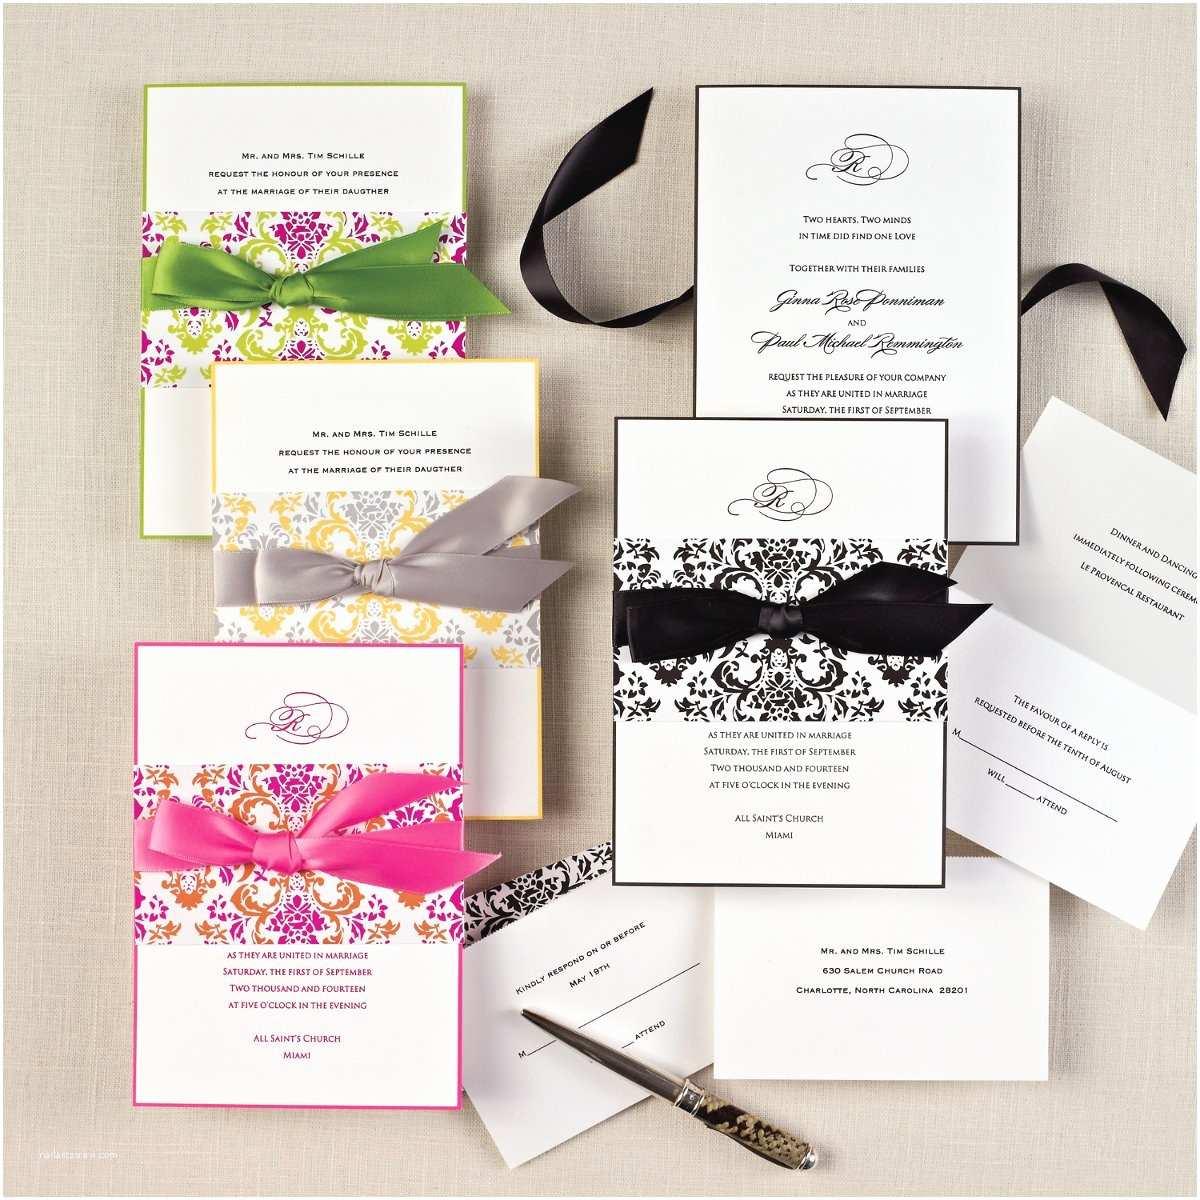 Exclusive Wedding Invitations Wedding Invitations Wedding Invitations S by